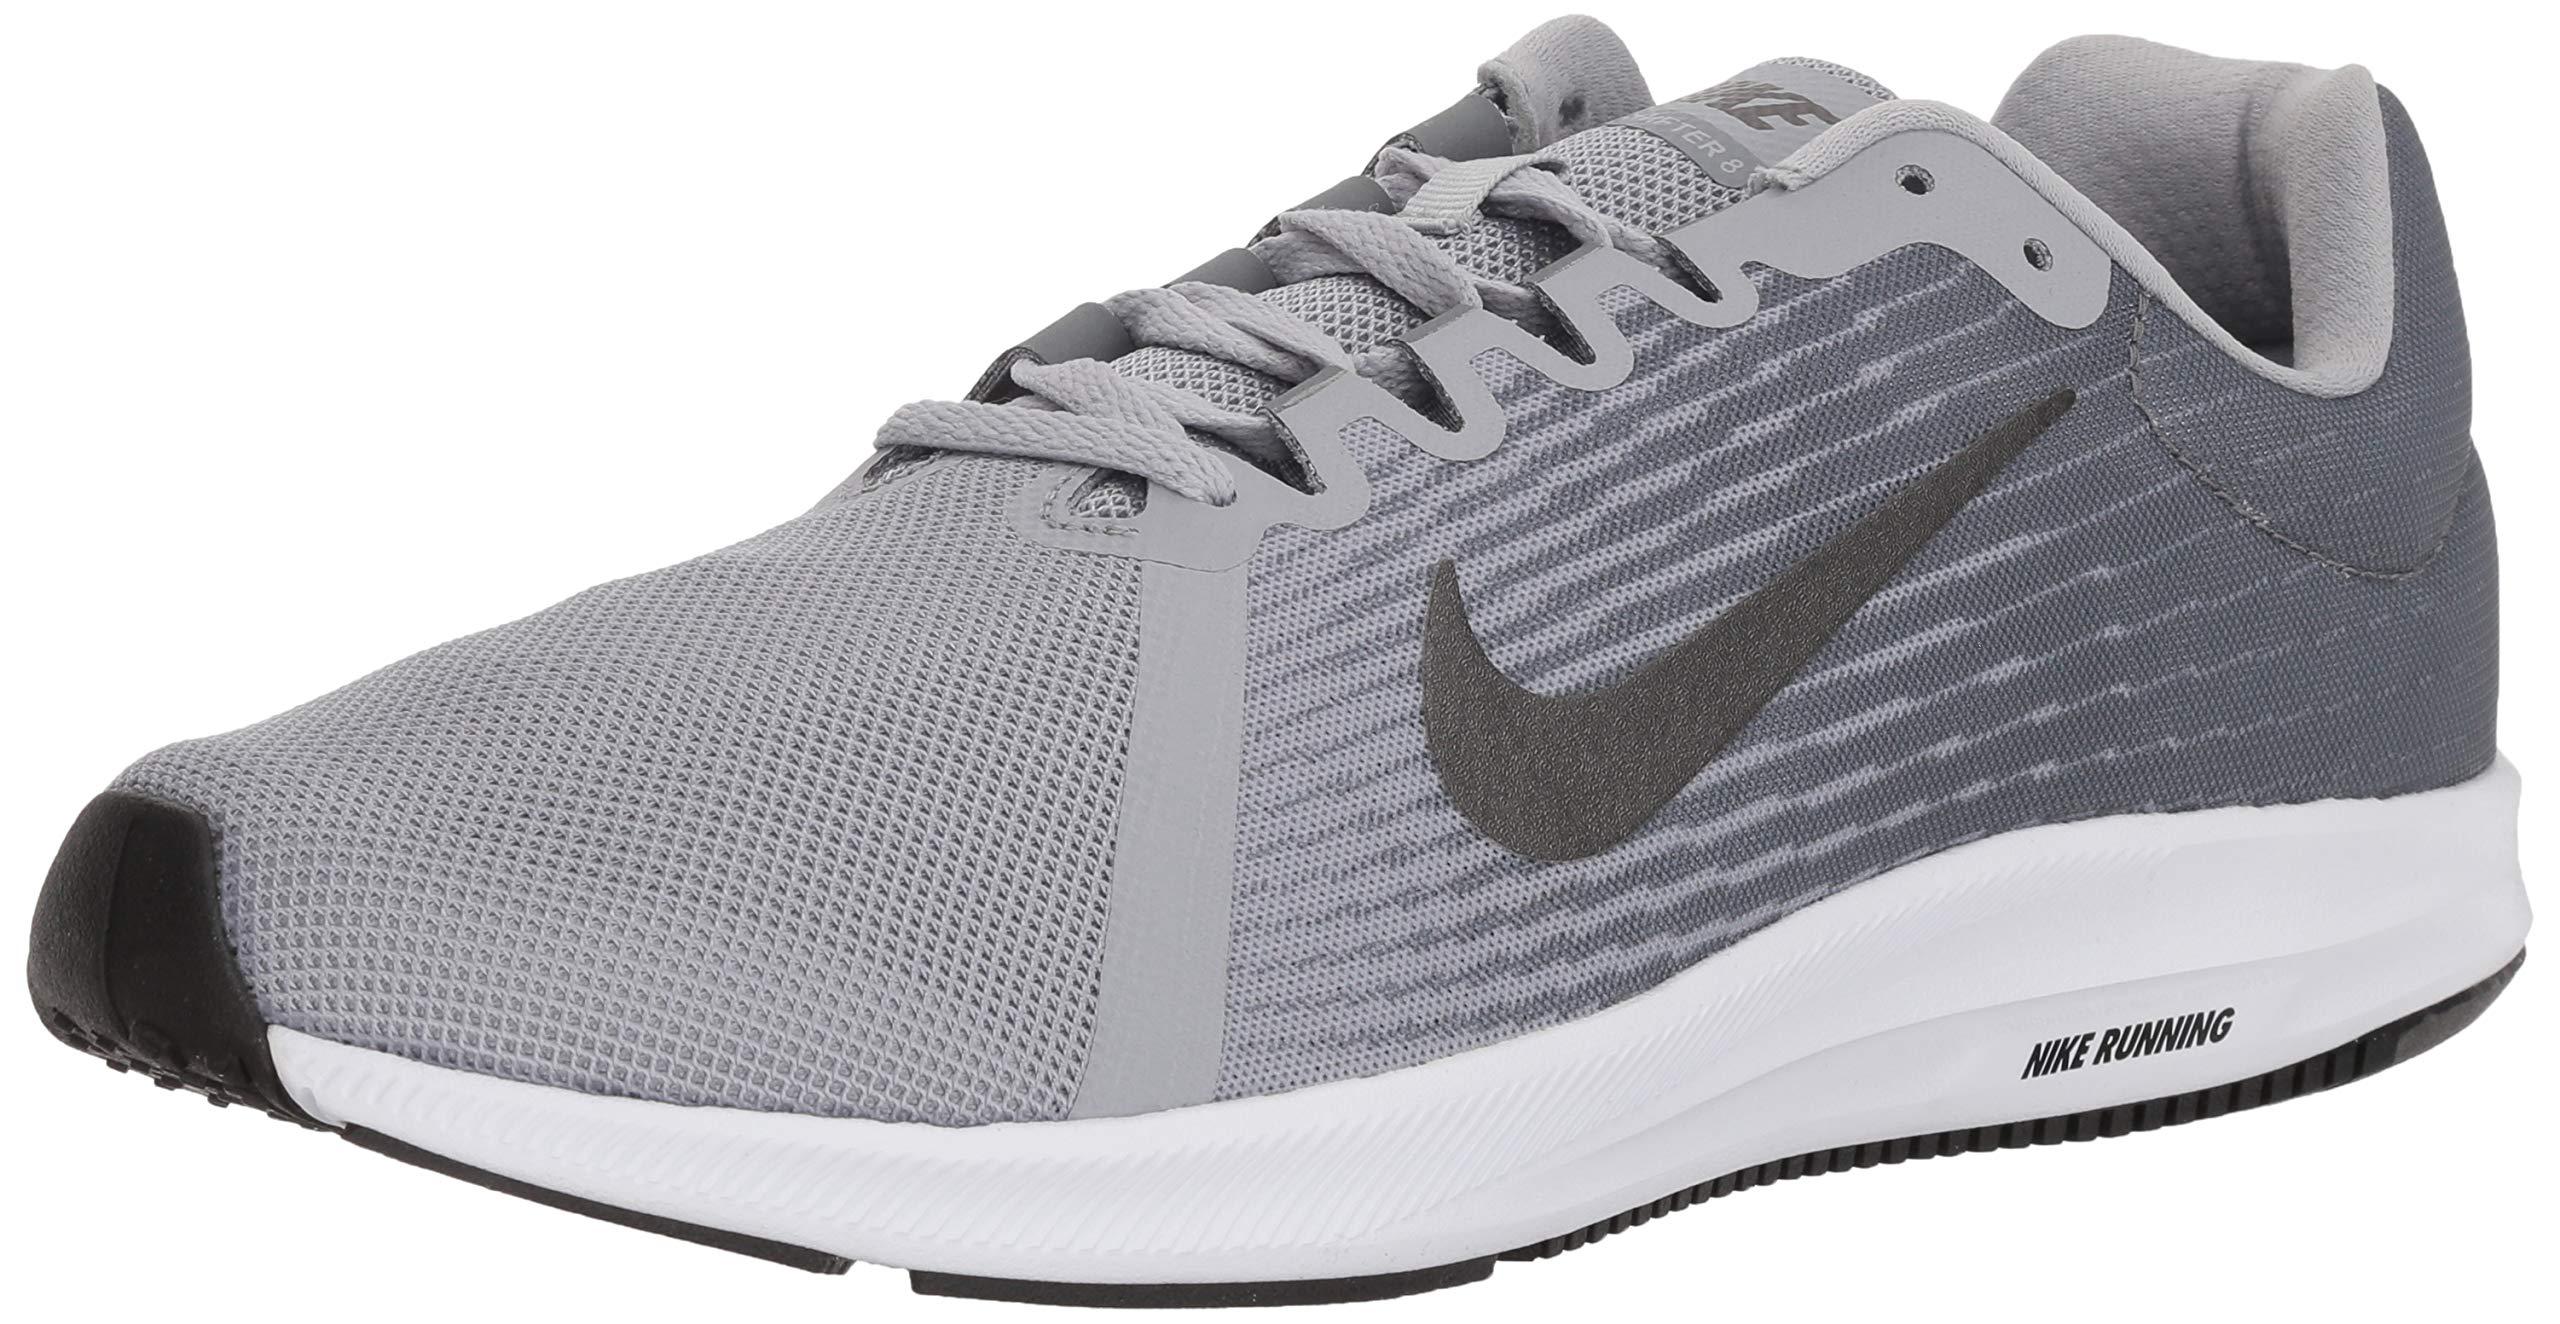 771046cac63 Galleon - Nike Men s Downshifter 8 Running Shoe